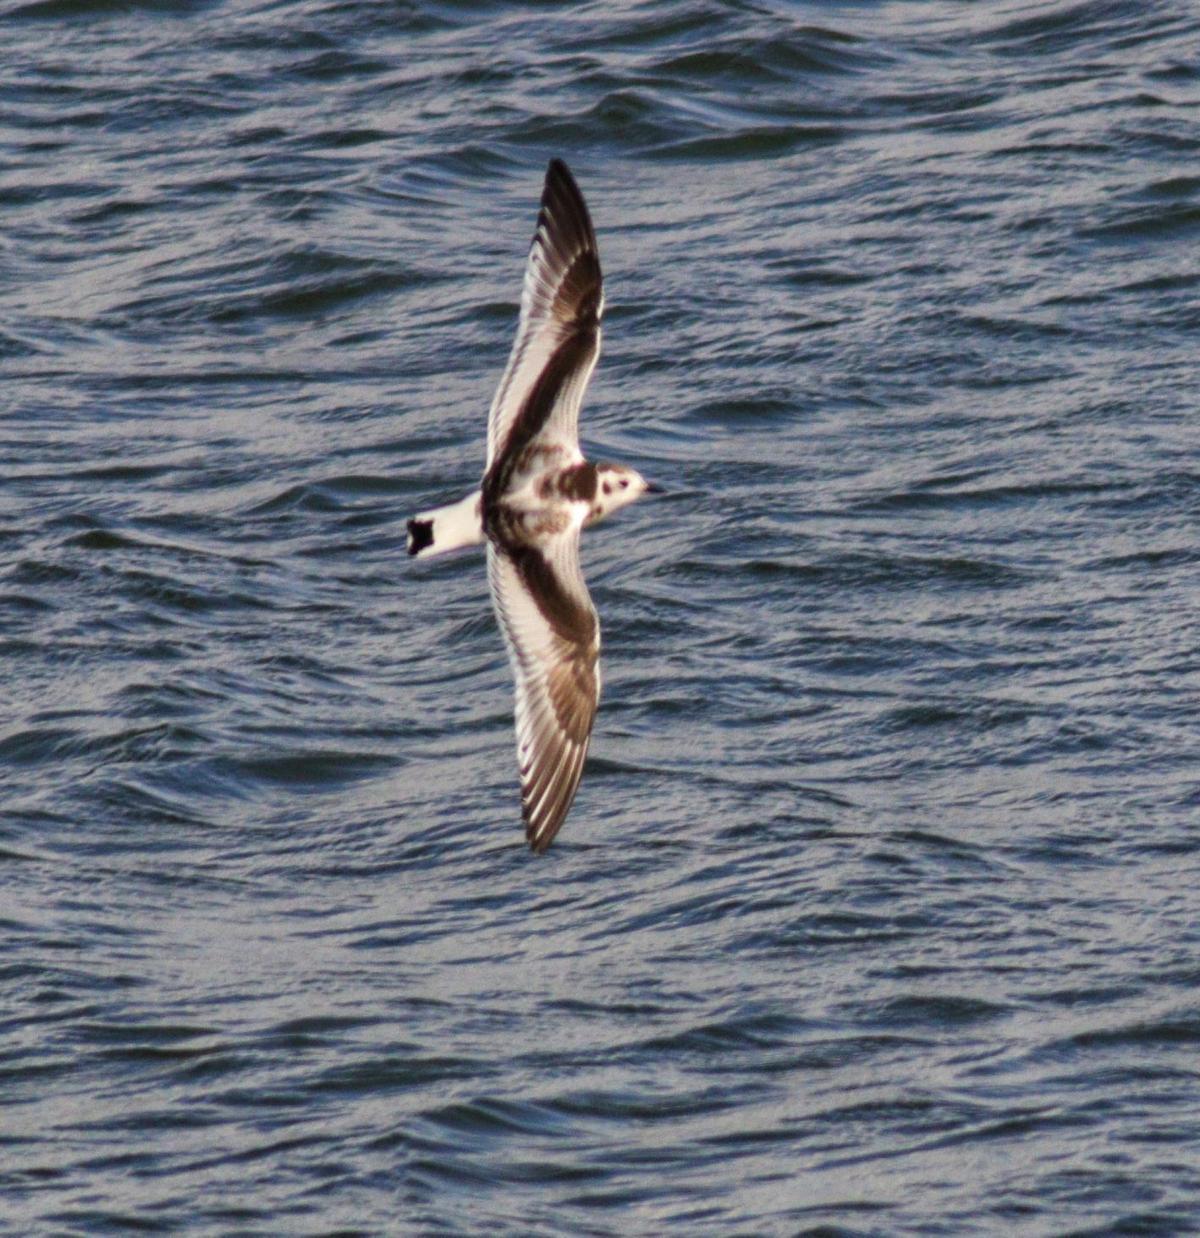 Little gull over water